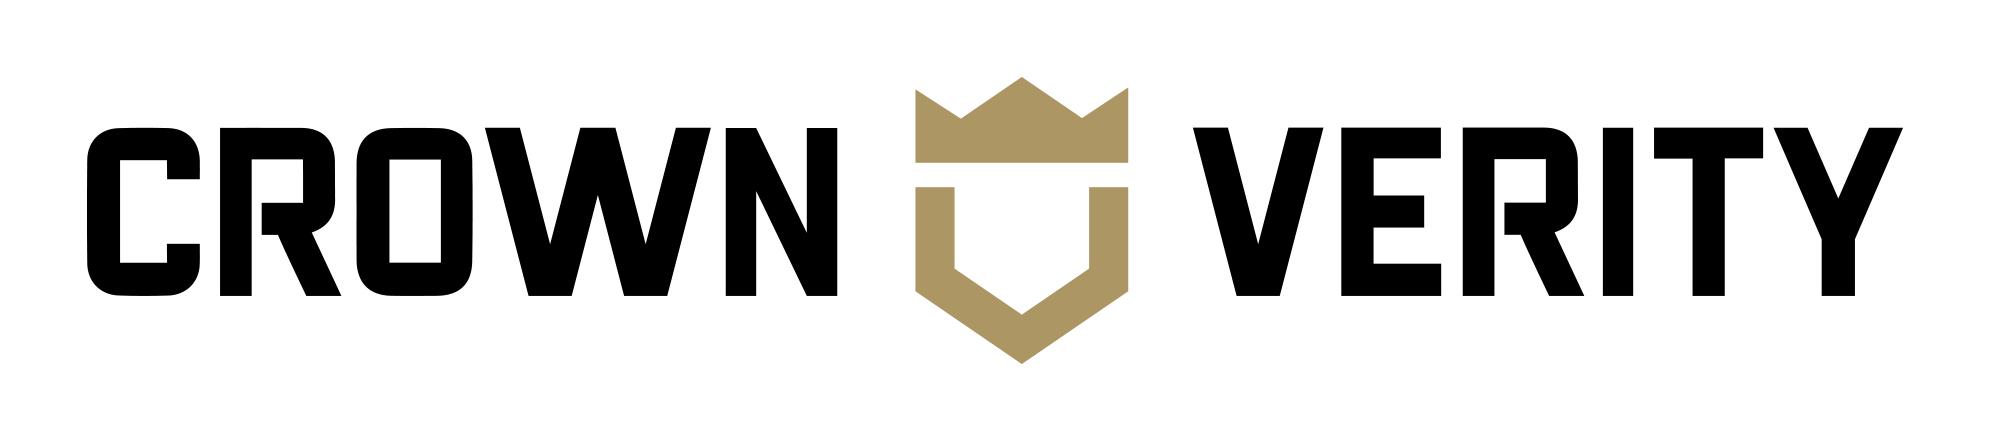 CrownVerity Logo 2016.jpg